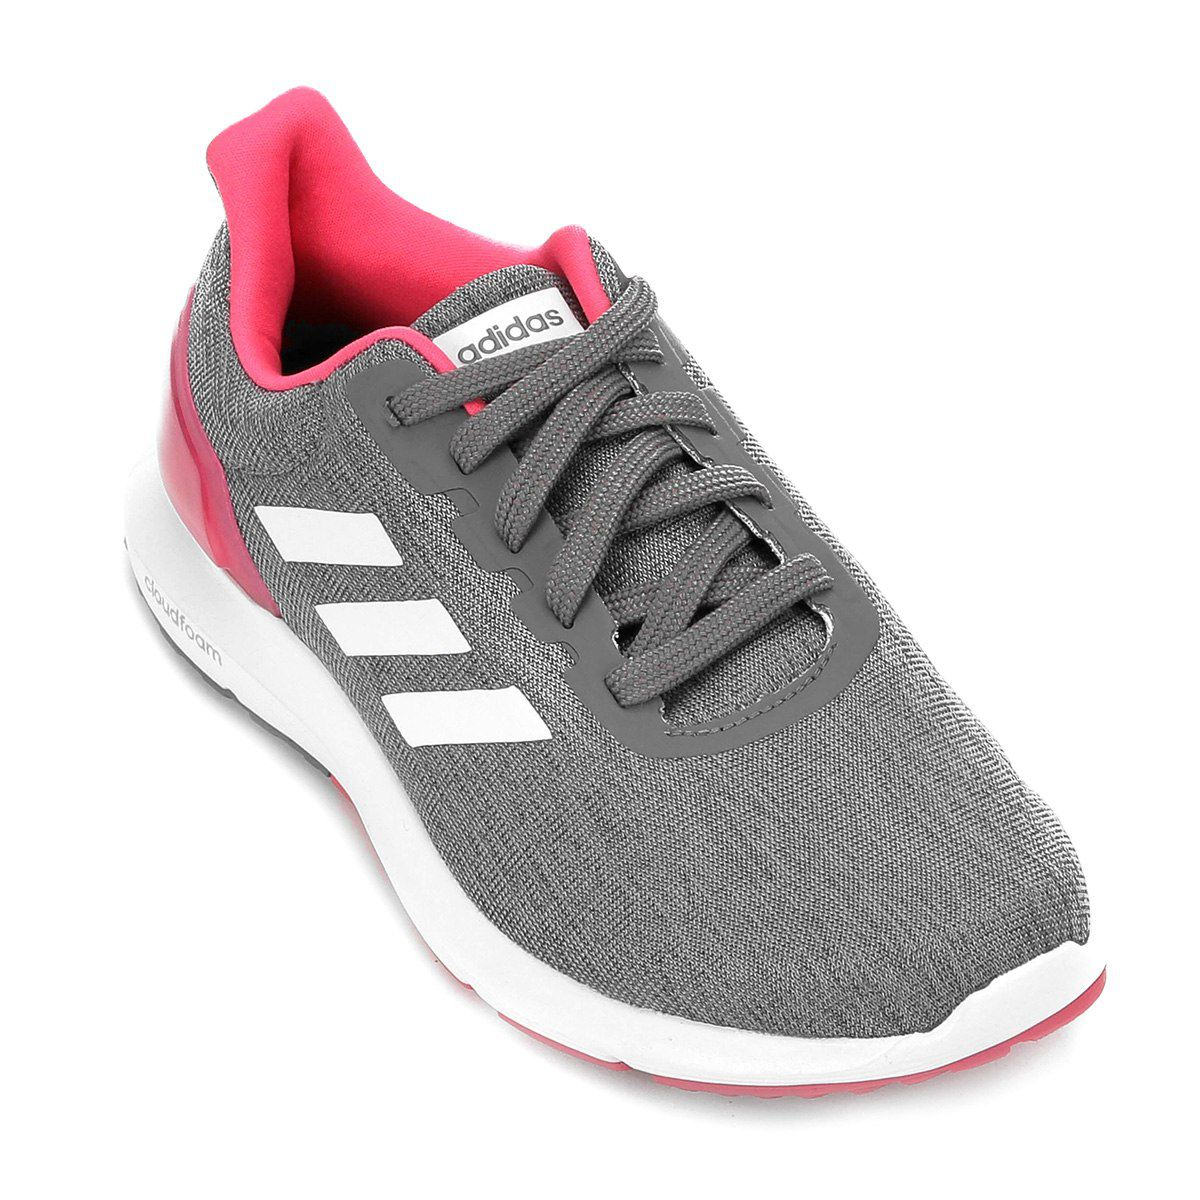 Tênis Adidas Cosmic 2 Feminino - Cinza e Branco